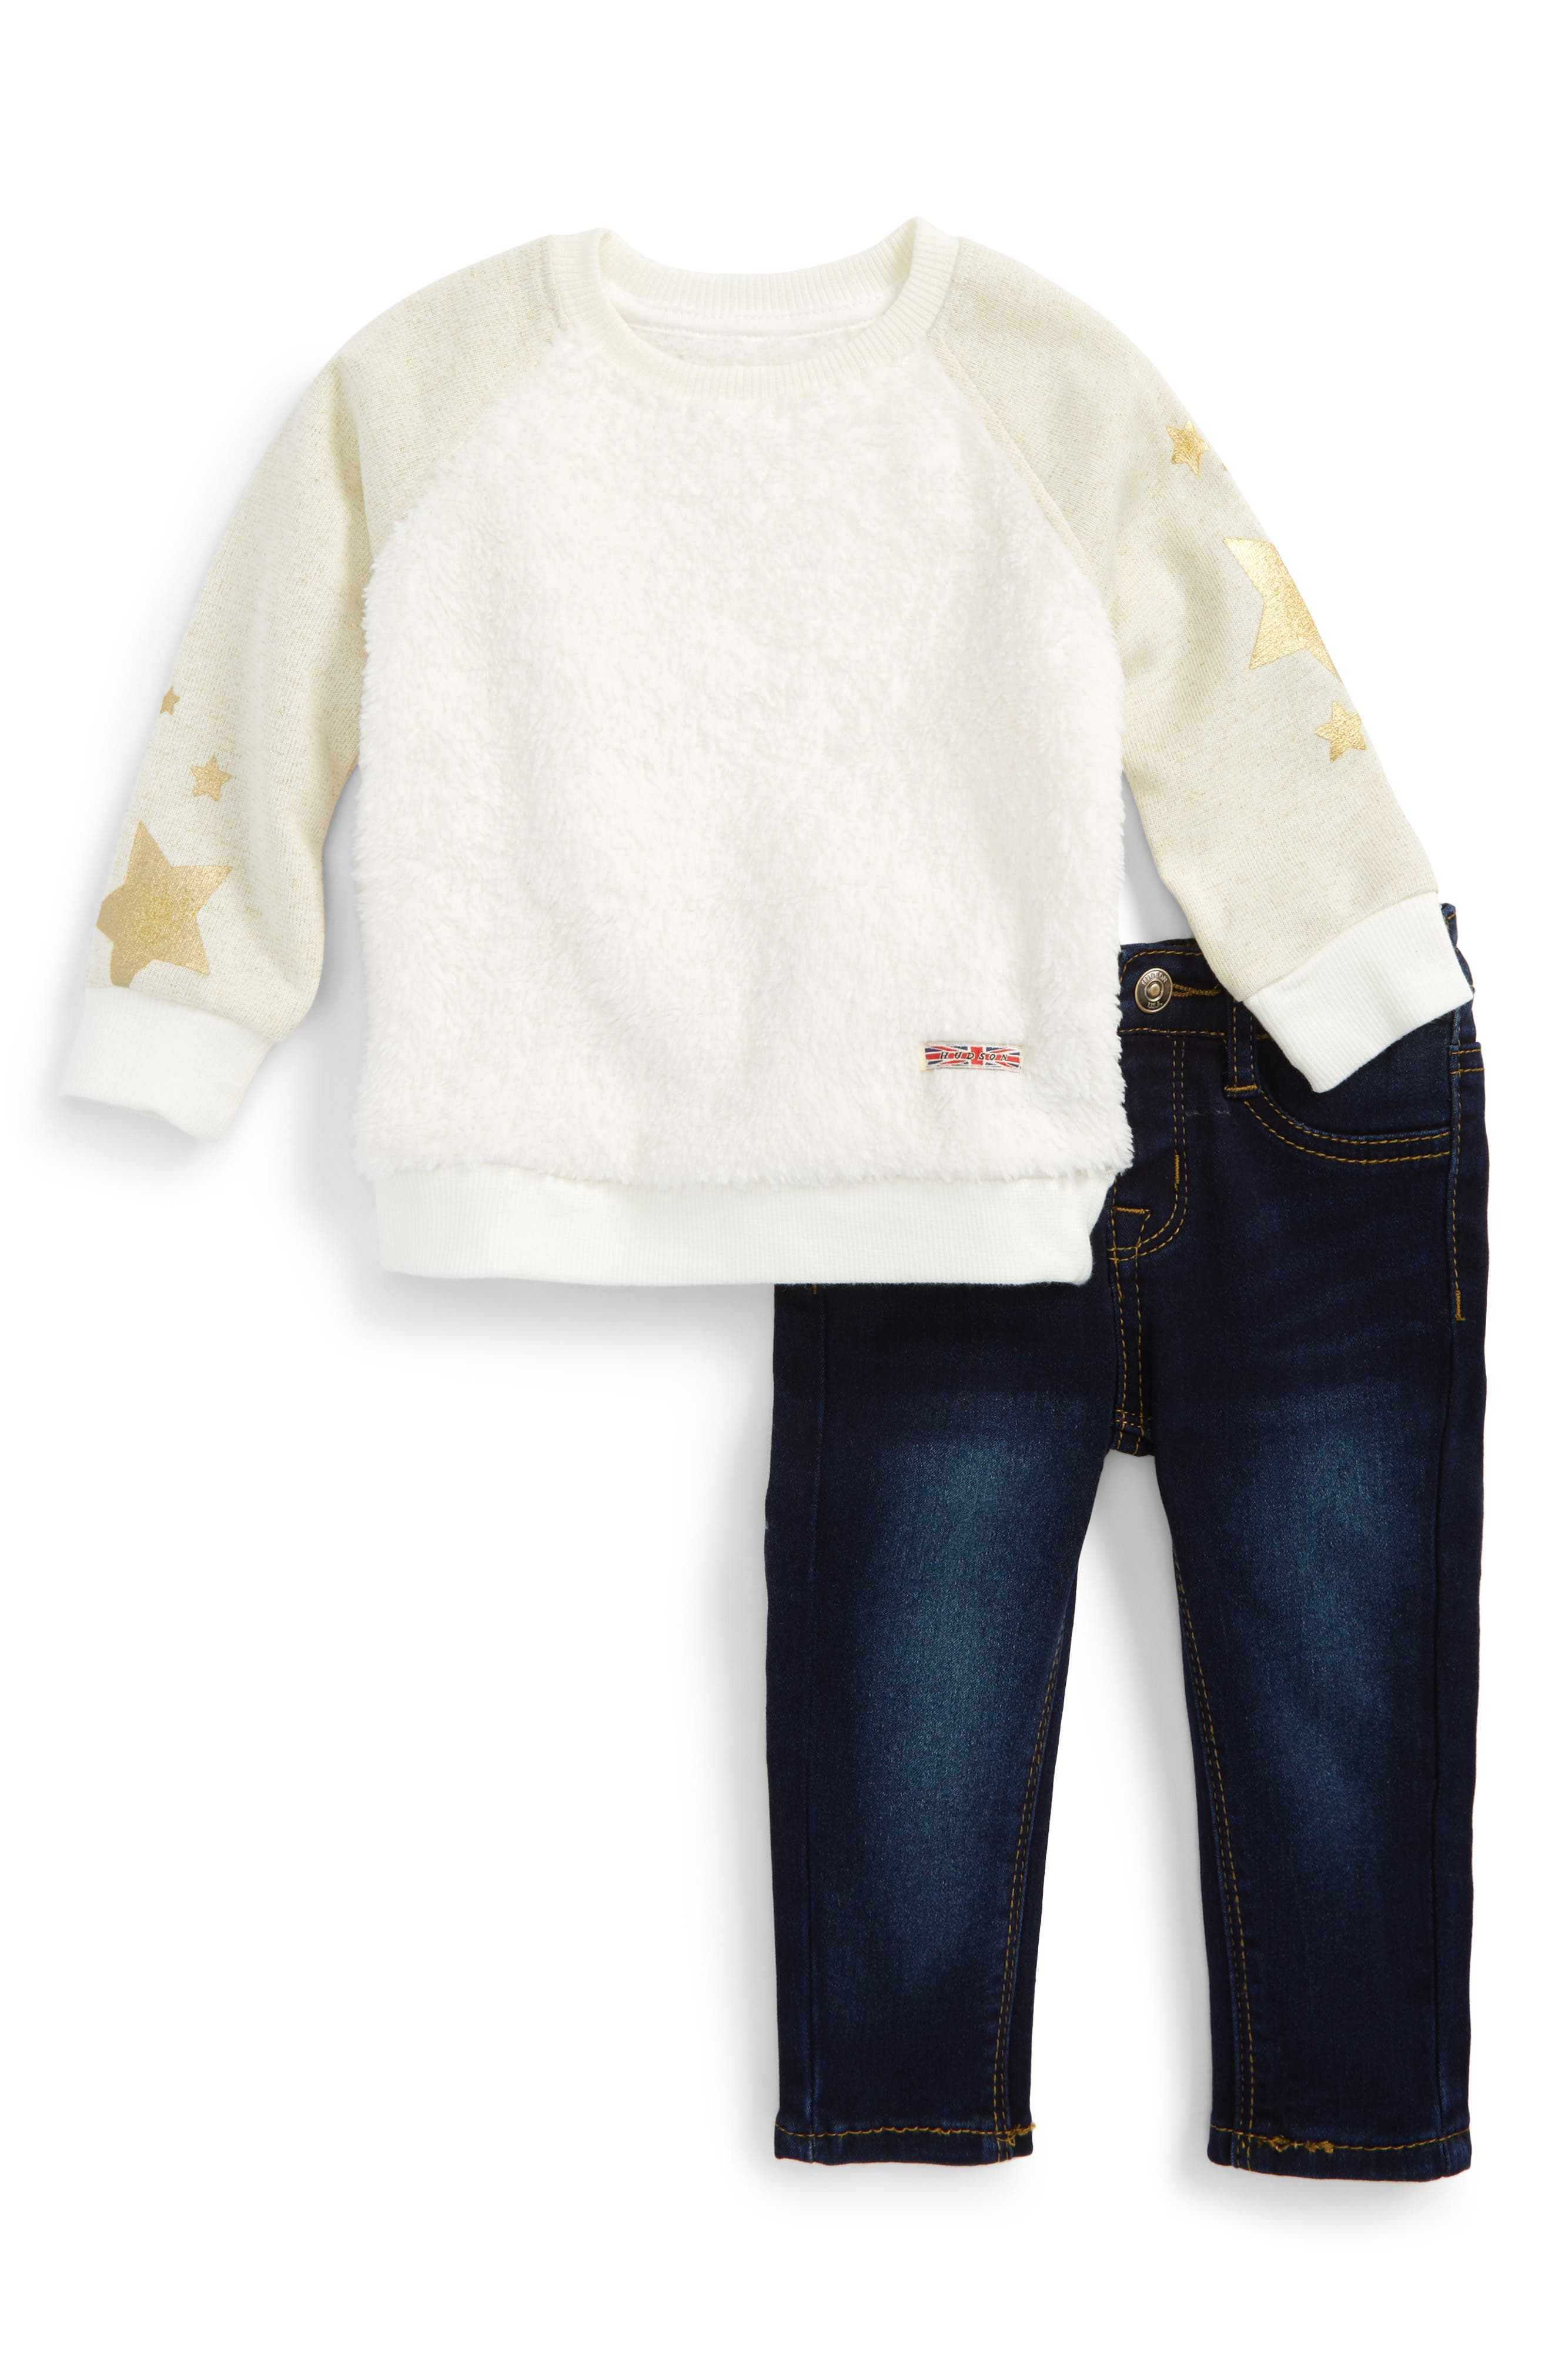 Alternate Image 1 Selected - Hudson Kids Fleece Sweatshirt & Jeans Set (Baby Girls)